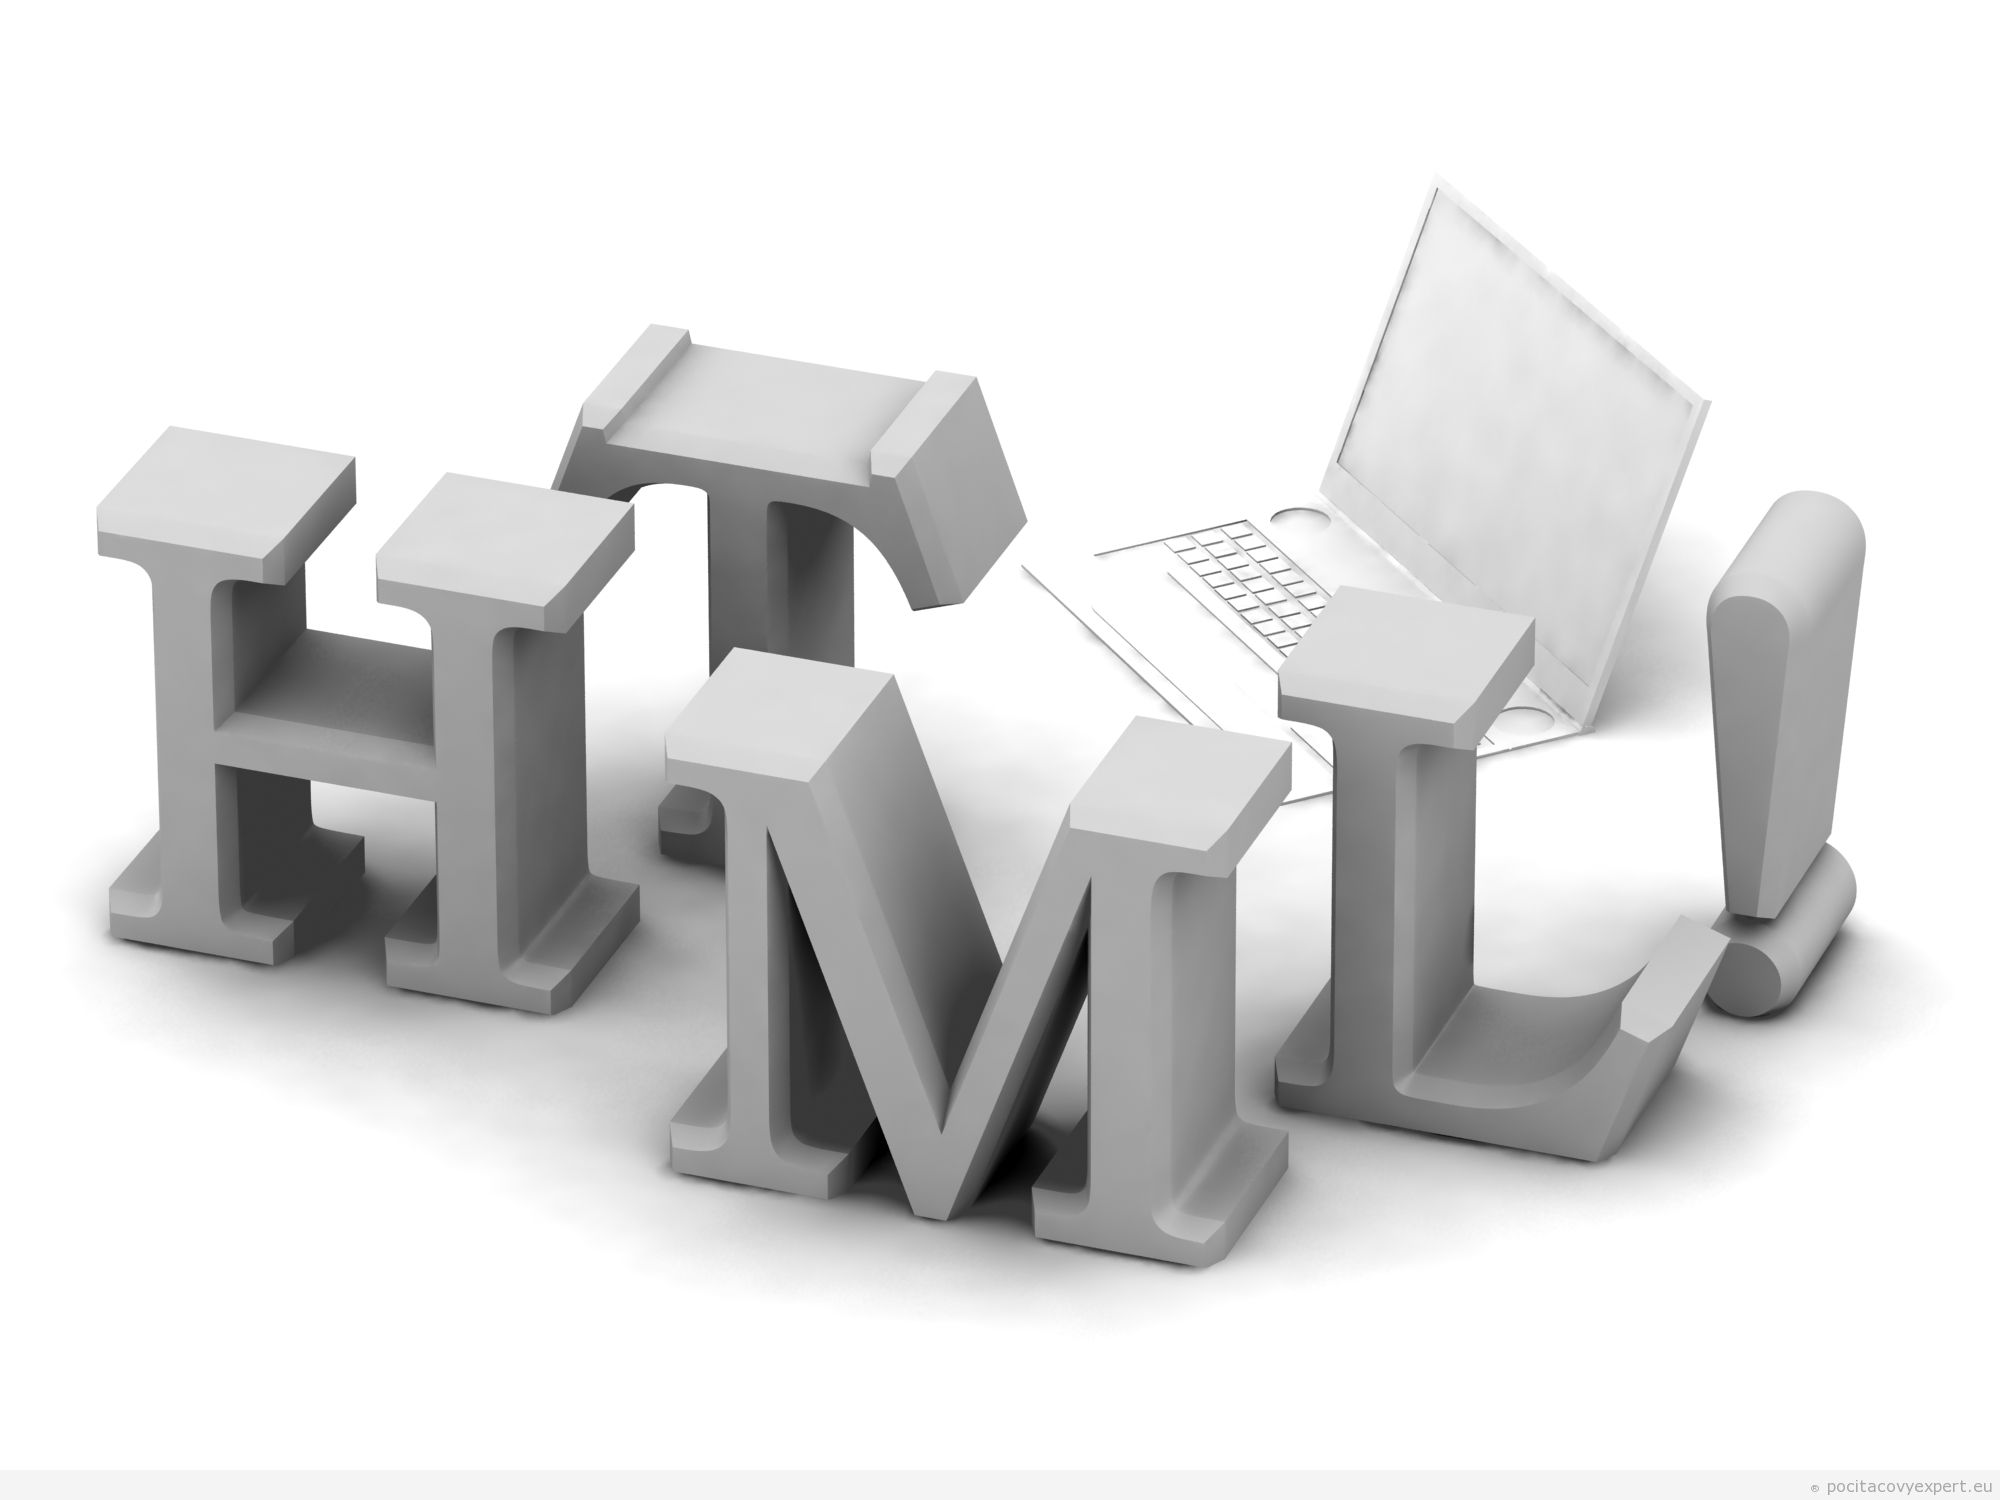 Vytvorenie dokumentu HTML